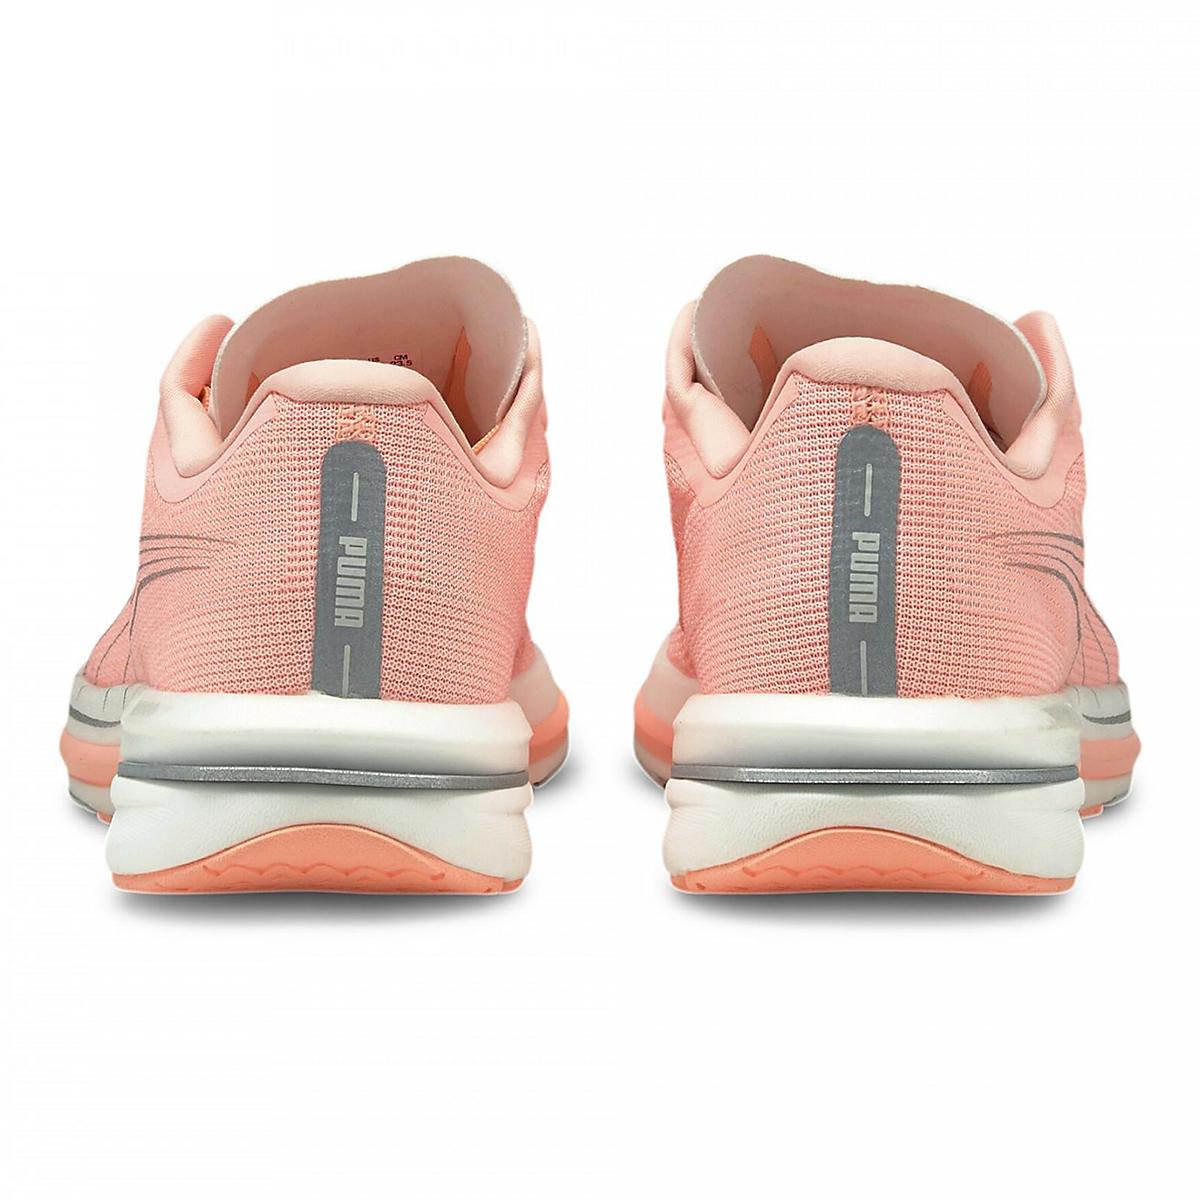 Women's Puma Velocity Nitro Running Shoe - Color: Elektro Peach-Puma Silver - Size: 5.5 - Width: Regular, Elektro Peach-Puma Silver, large, image 3